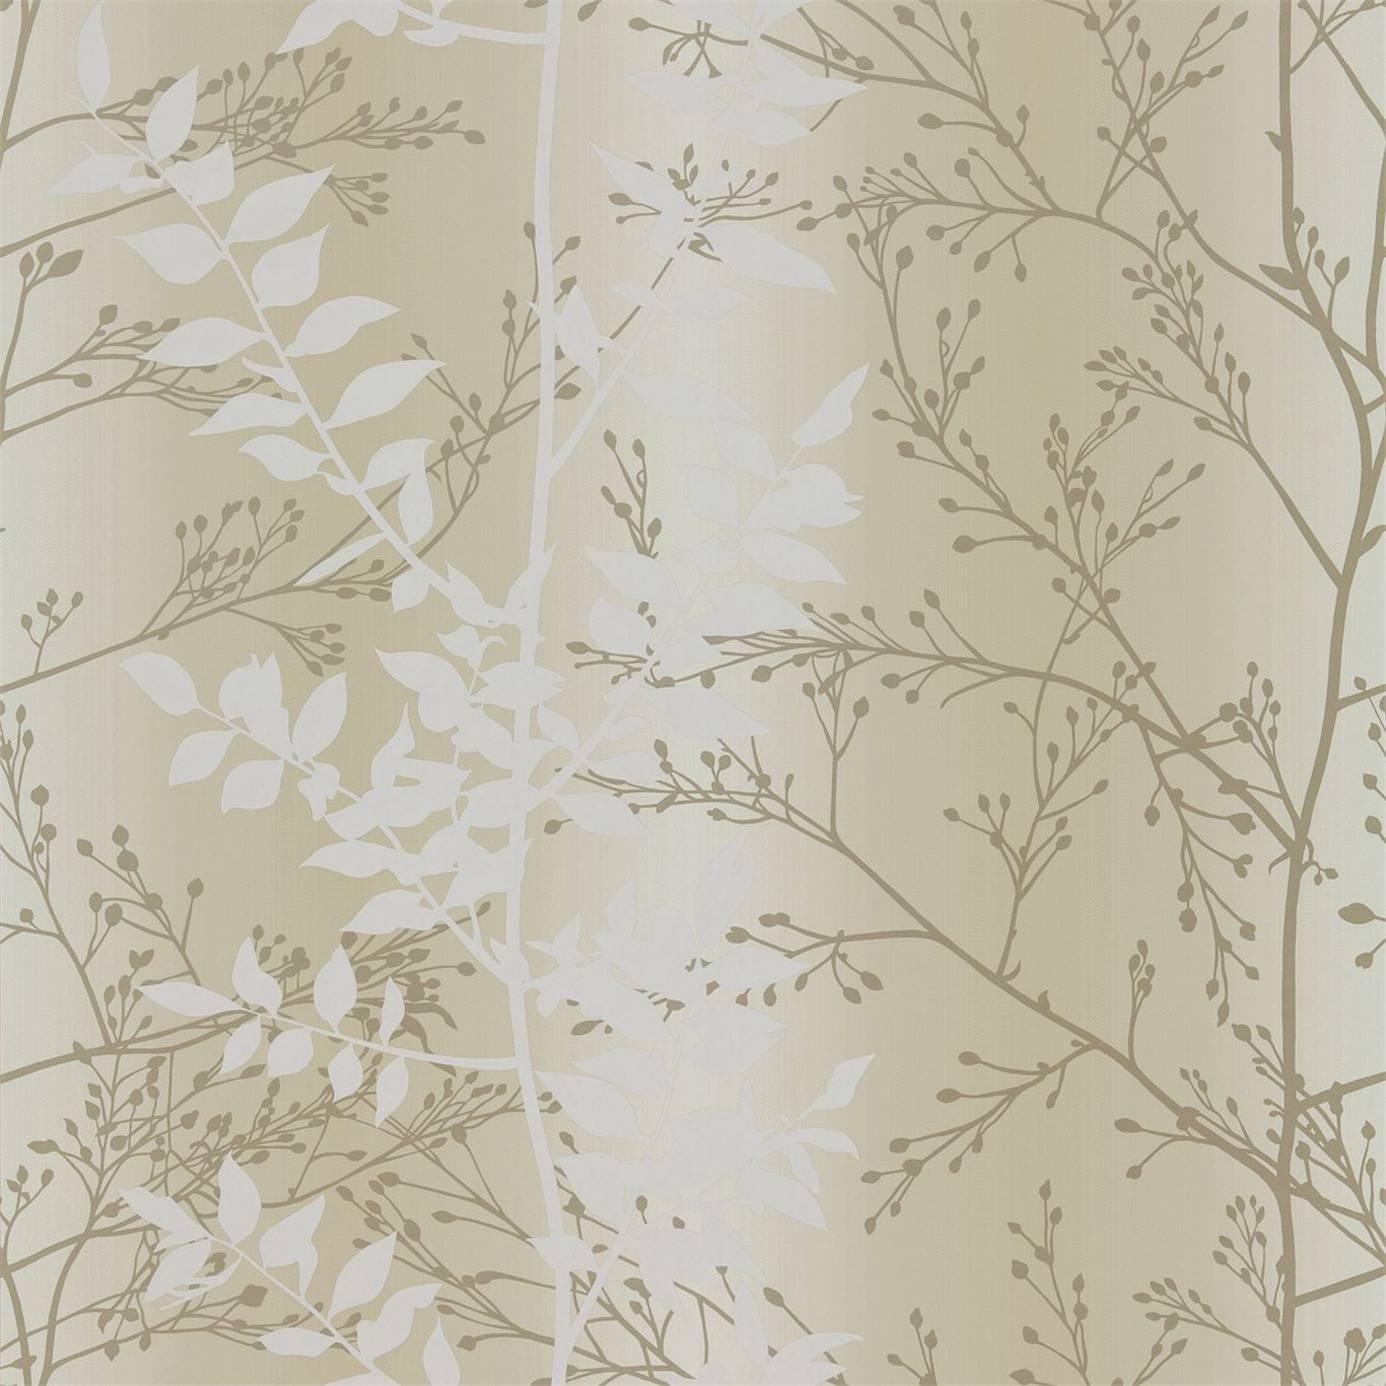 Home Wallpapers Harlequin Kallianthi Wallpapers Persephone Wallpaper 1386x1386